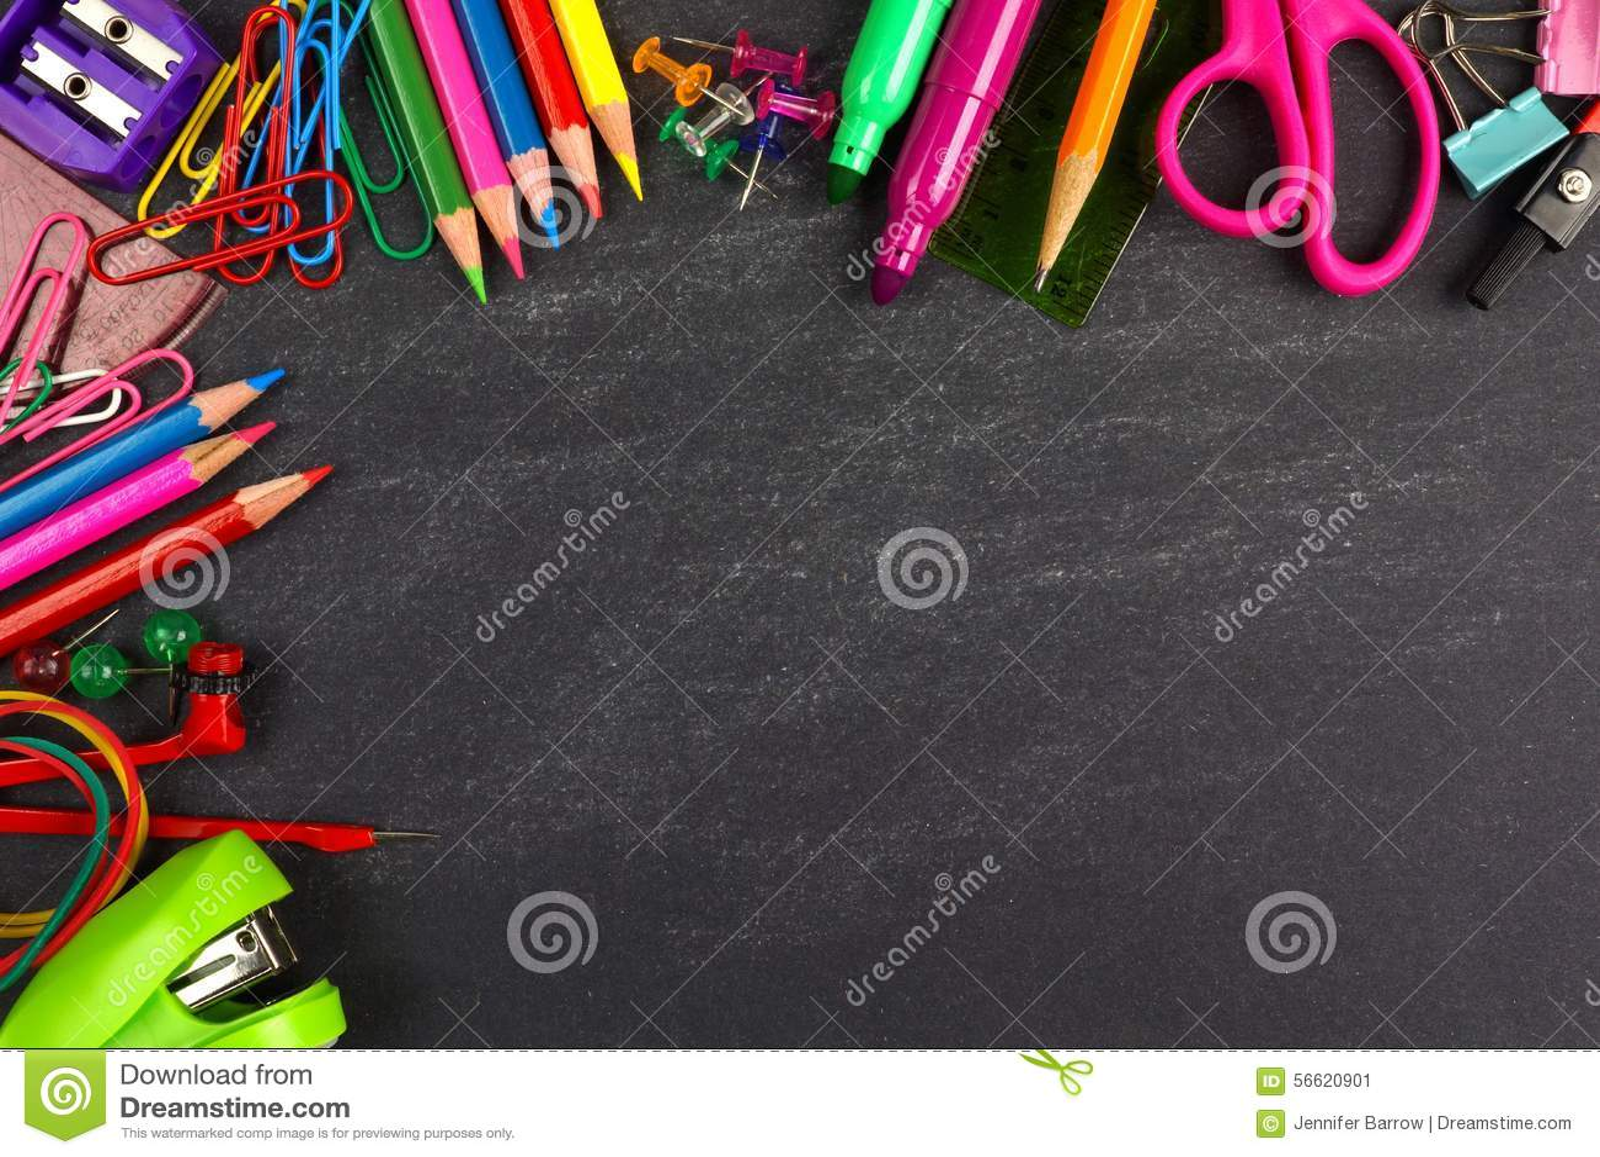 Chalkboard With School Supplies Corner Border Stock Photo